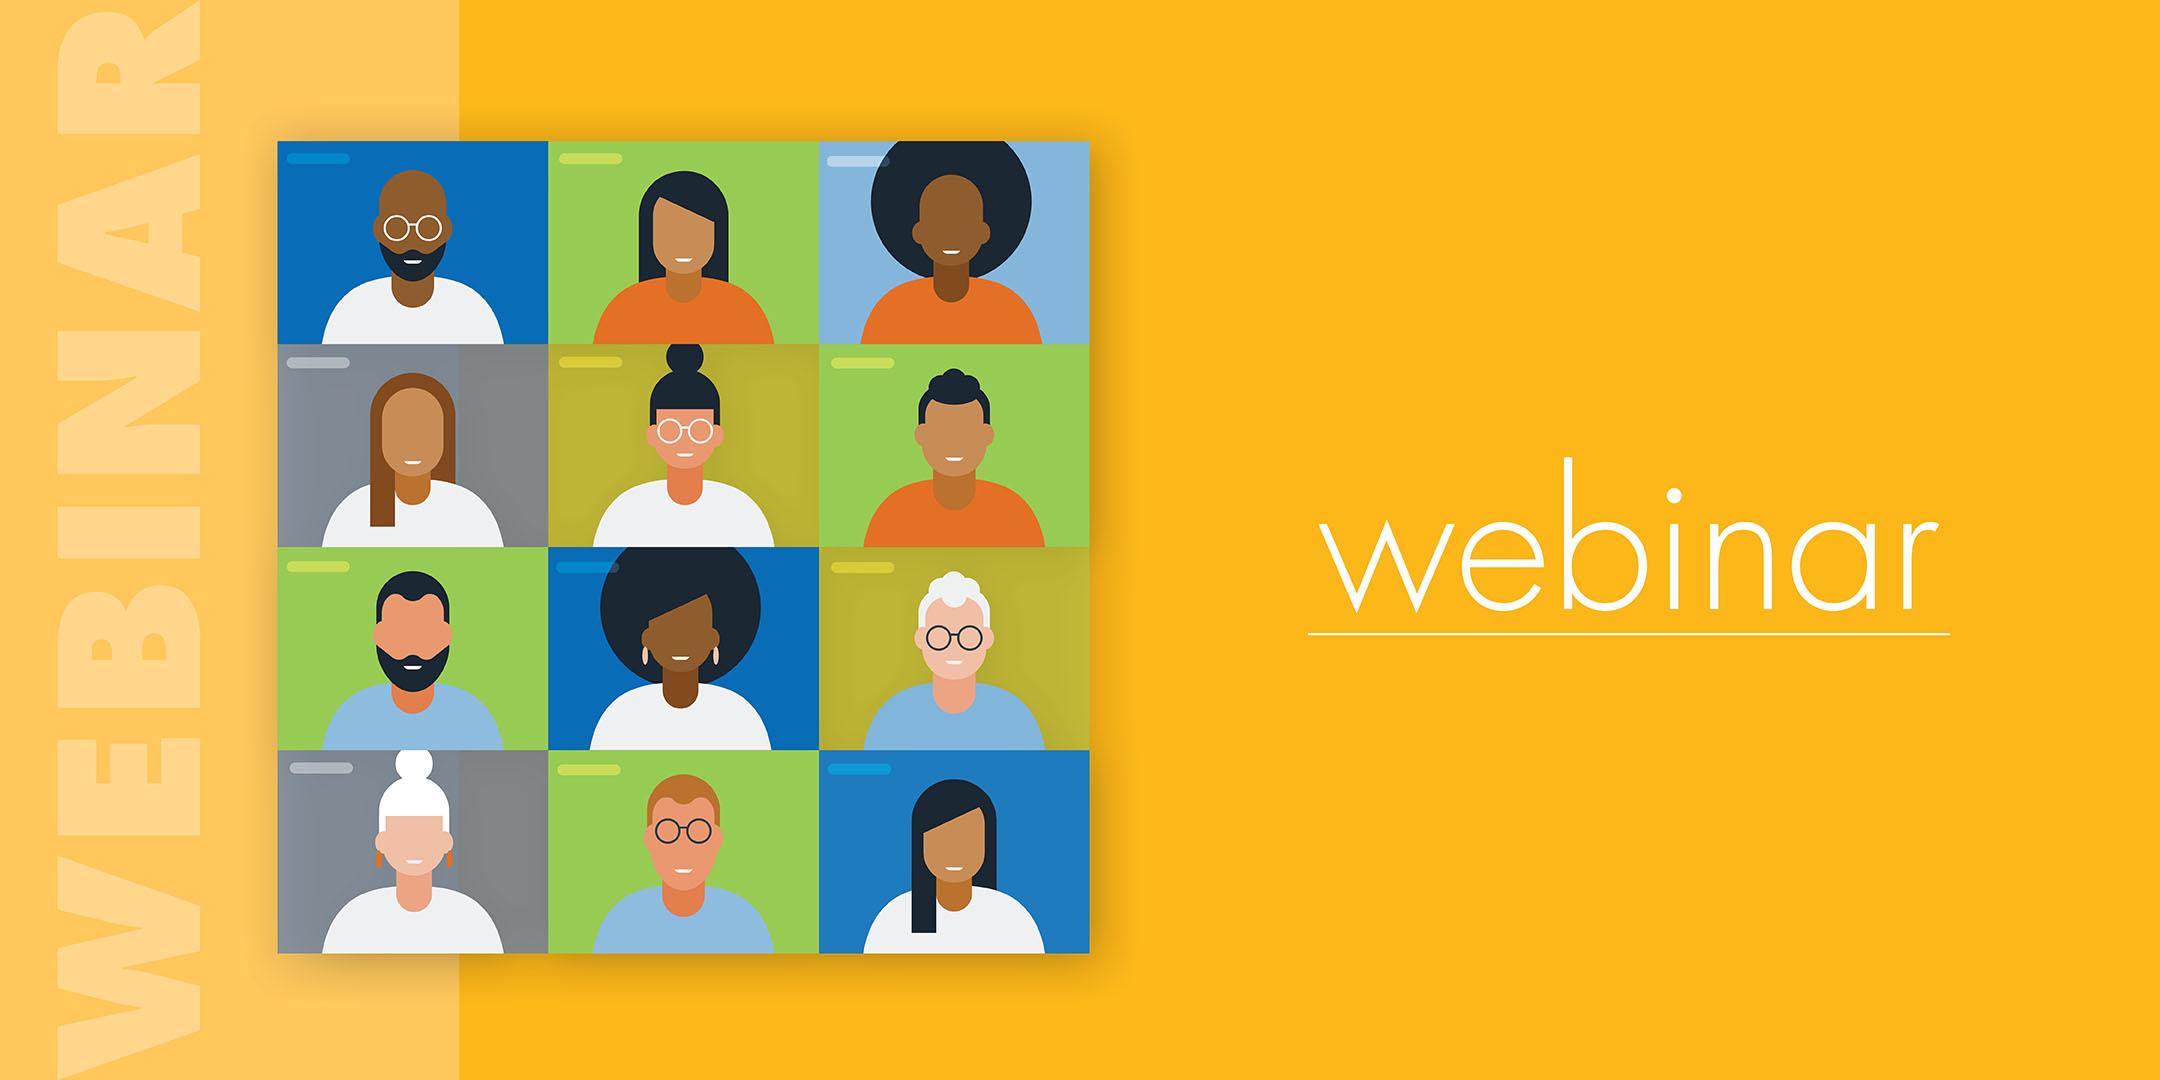 Talk by Ann Jordan: Benefits to Members of New ASQ + ASQE Organization 3225